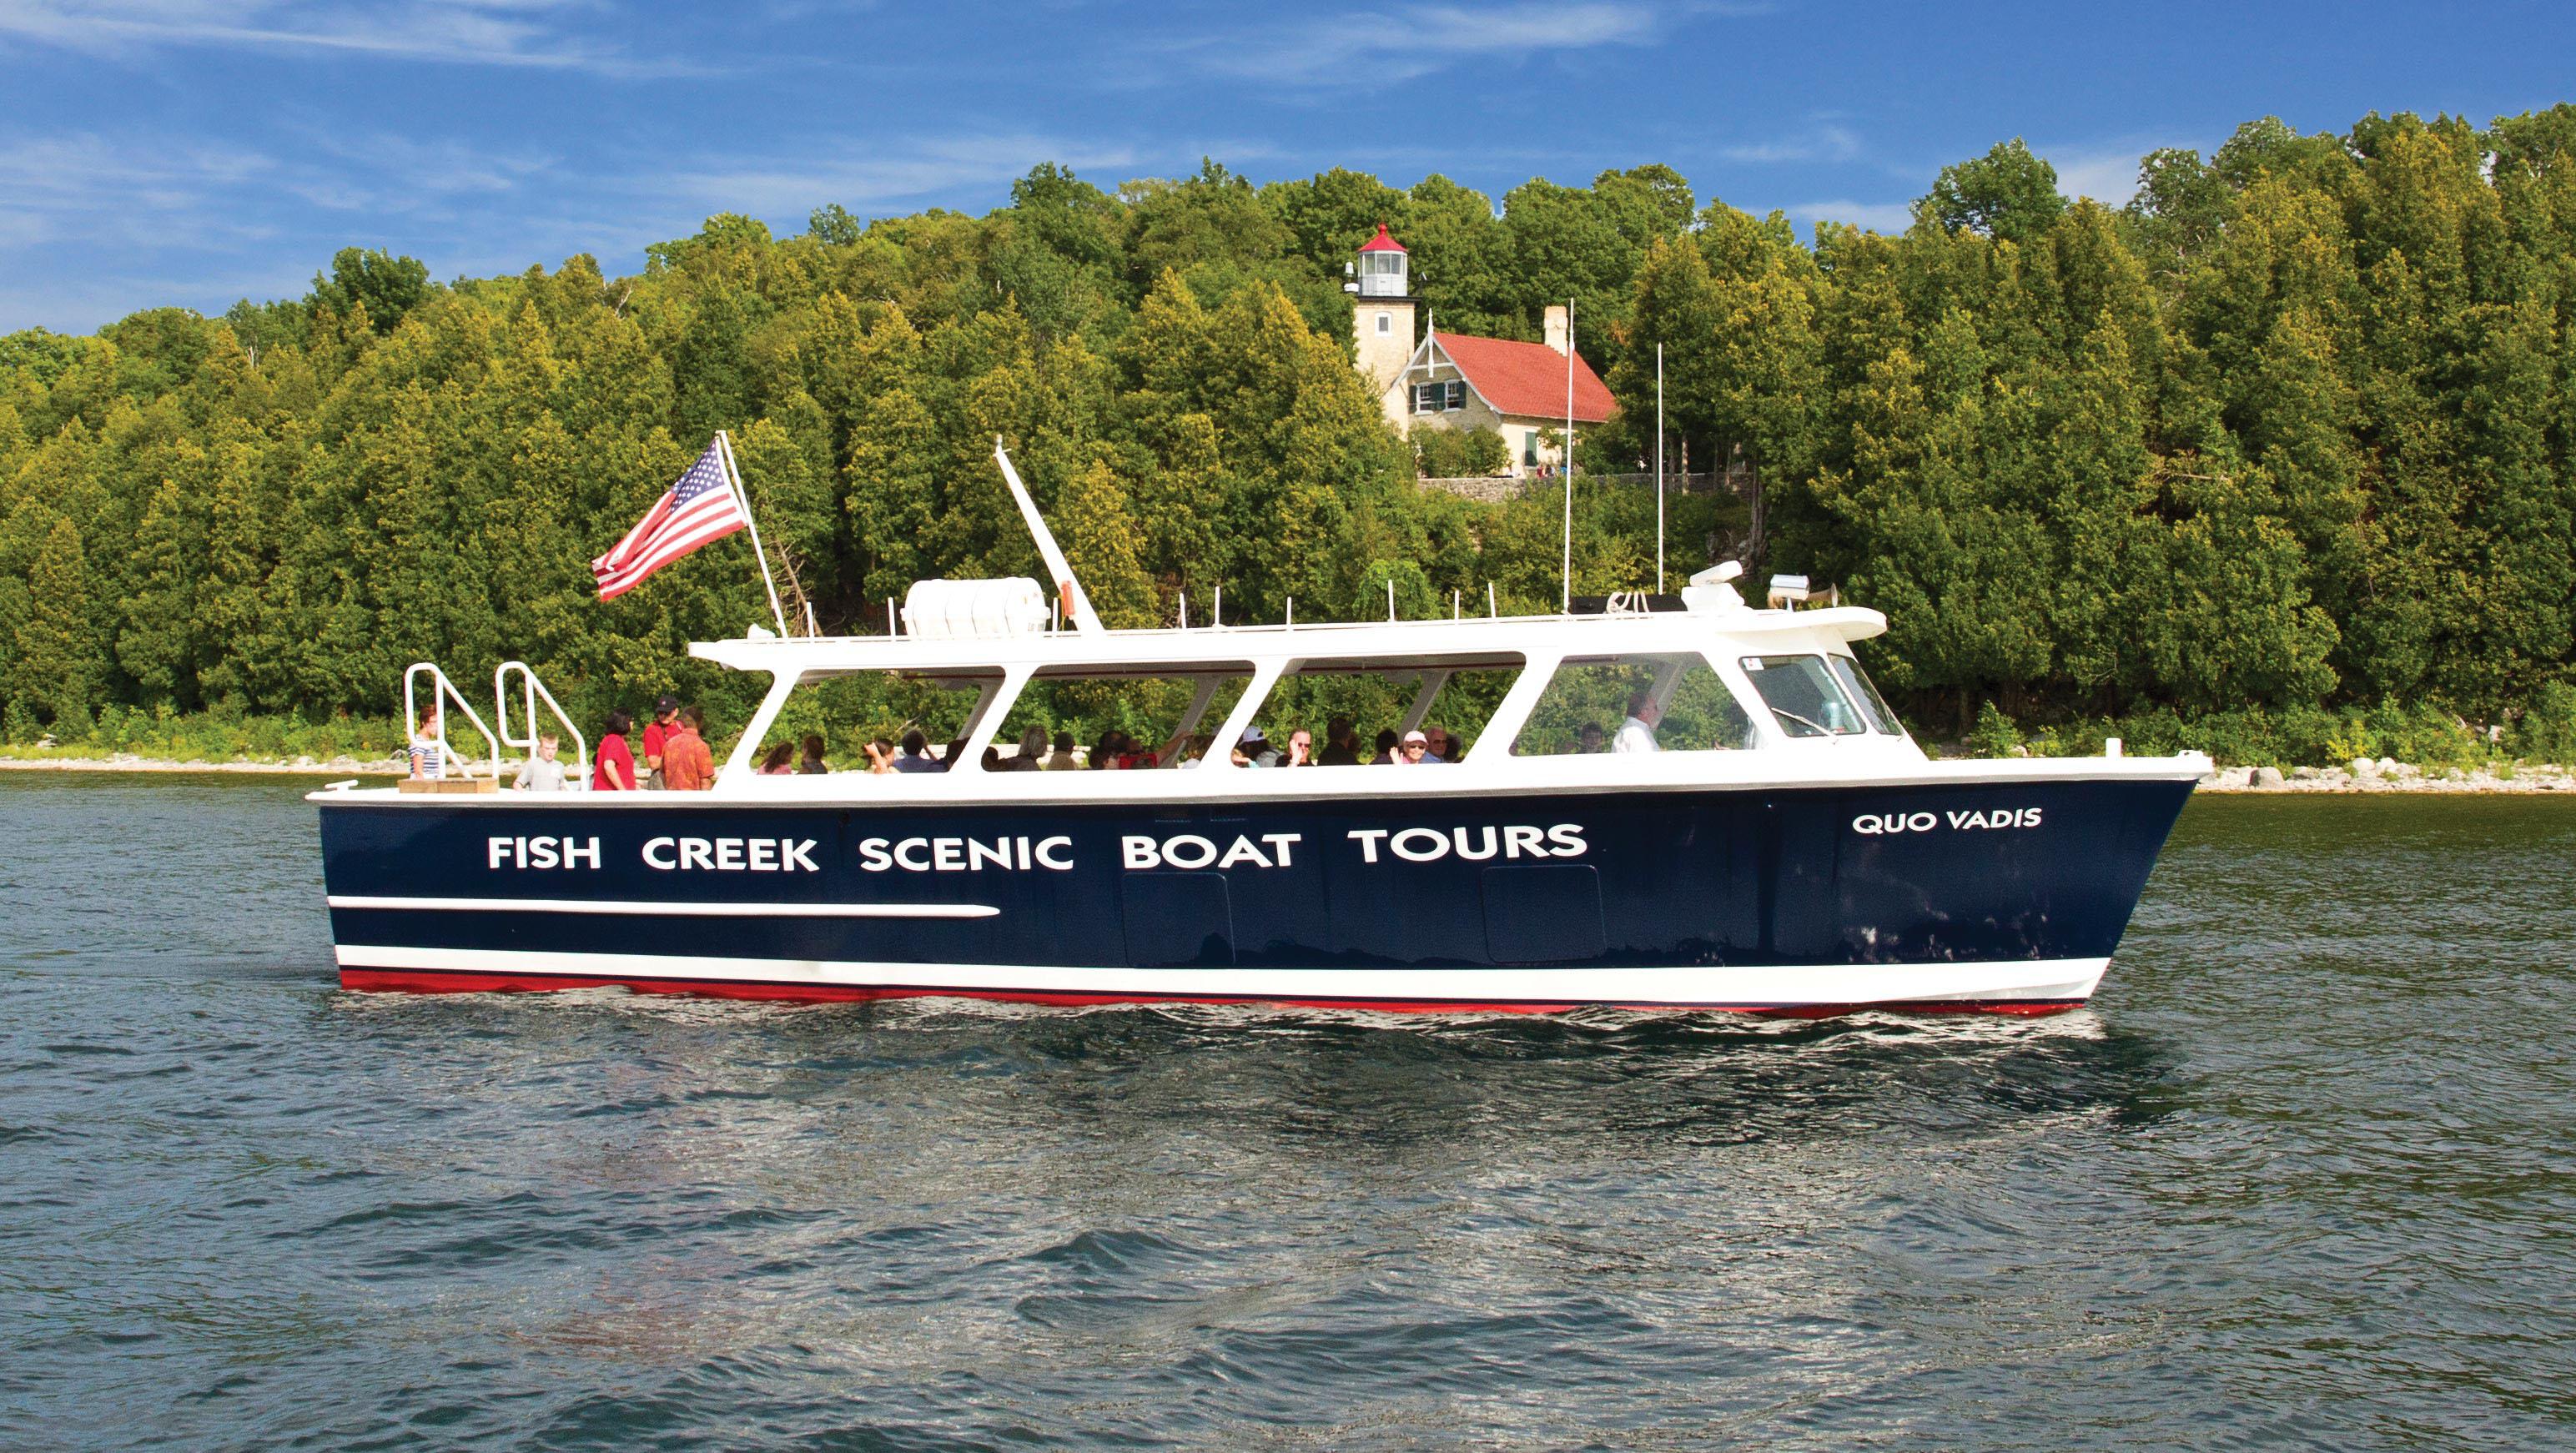 Boat & Jet Ski Rentals In Fish Creek and Sister Bay, WI